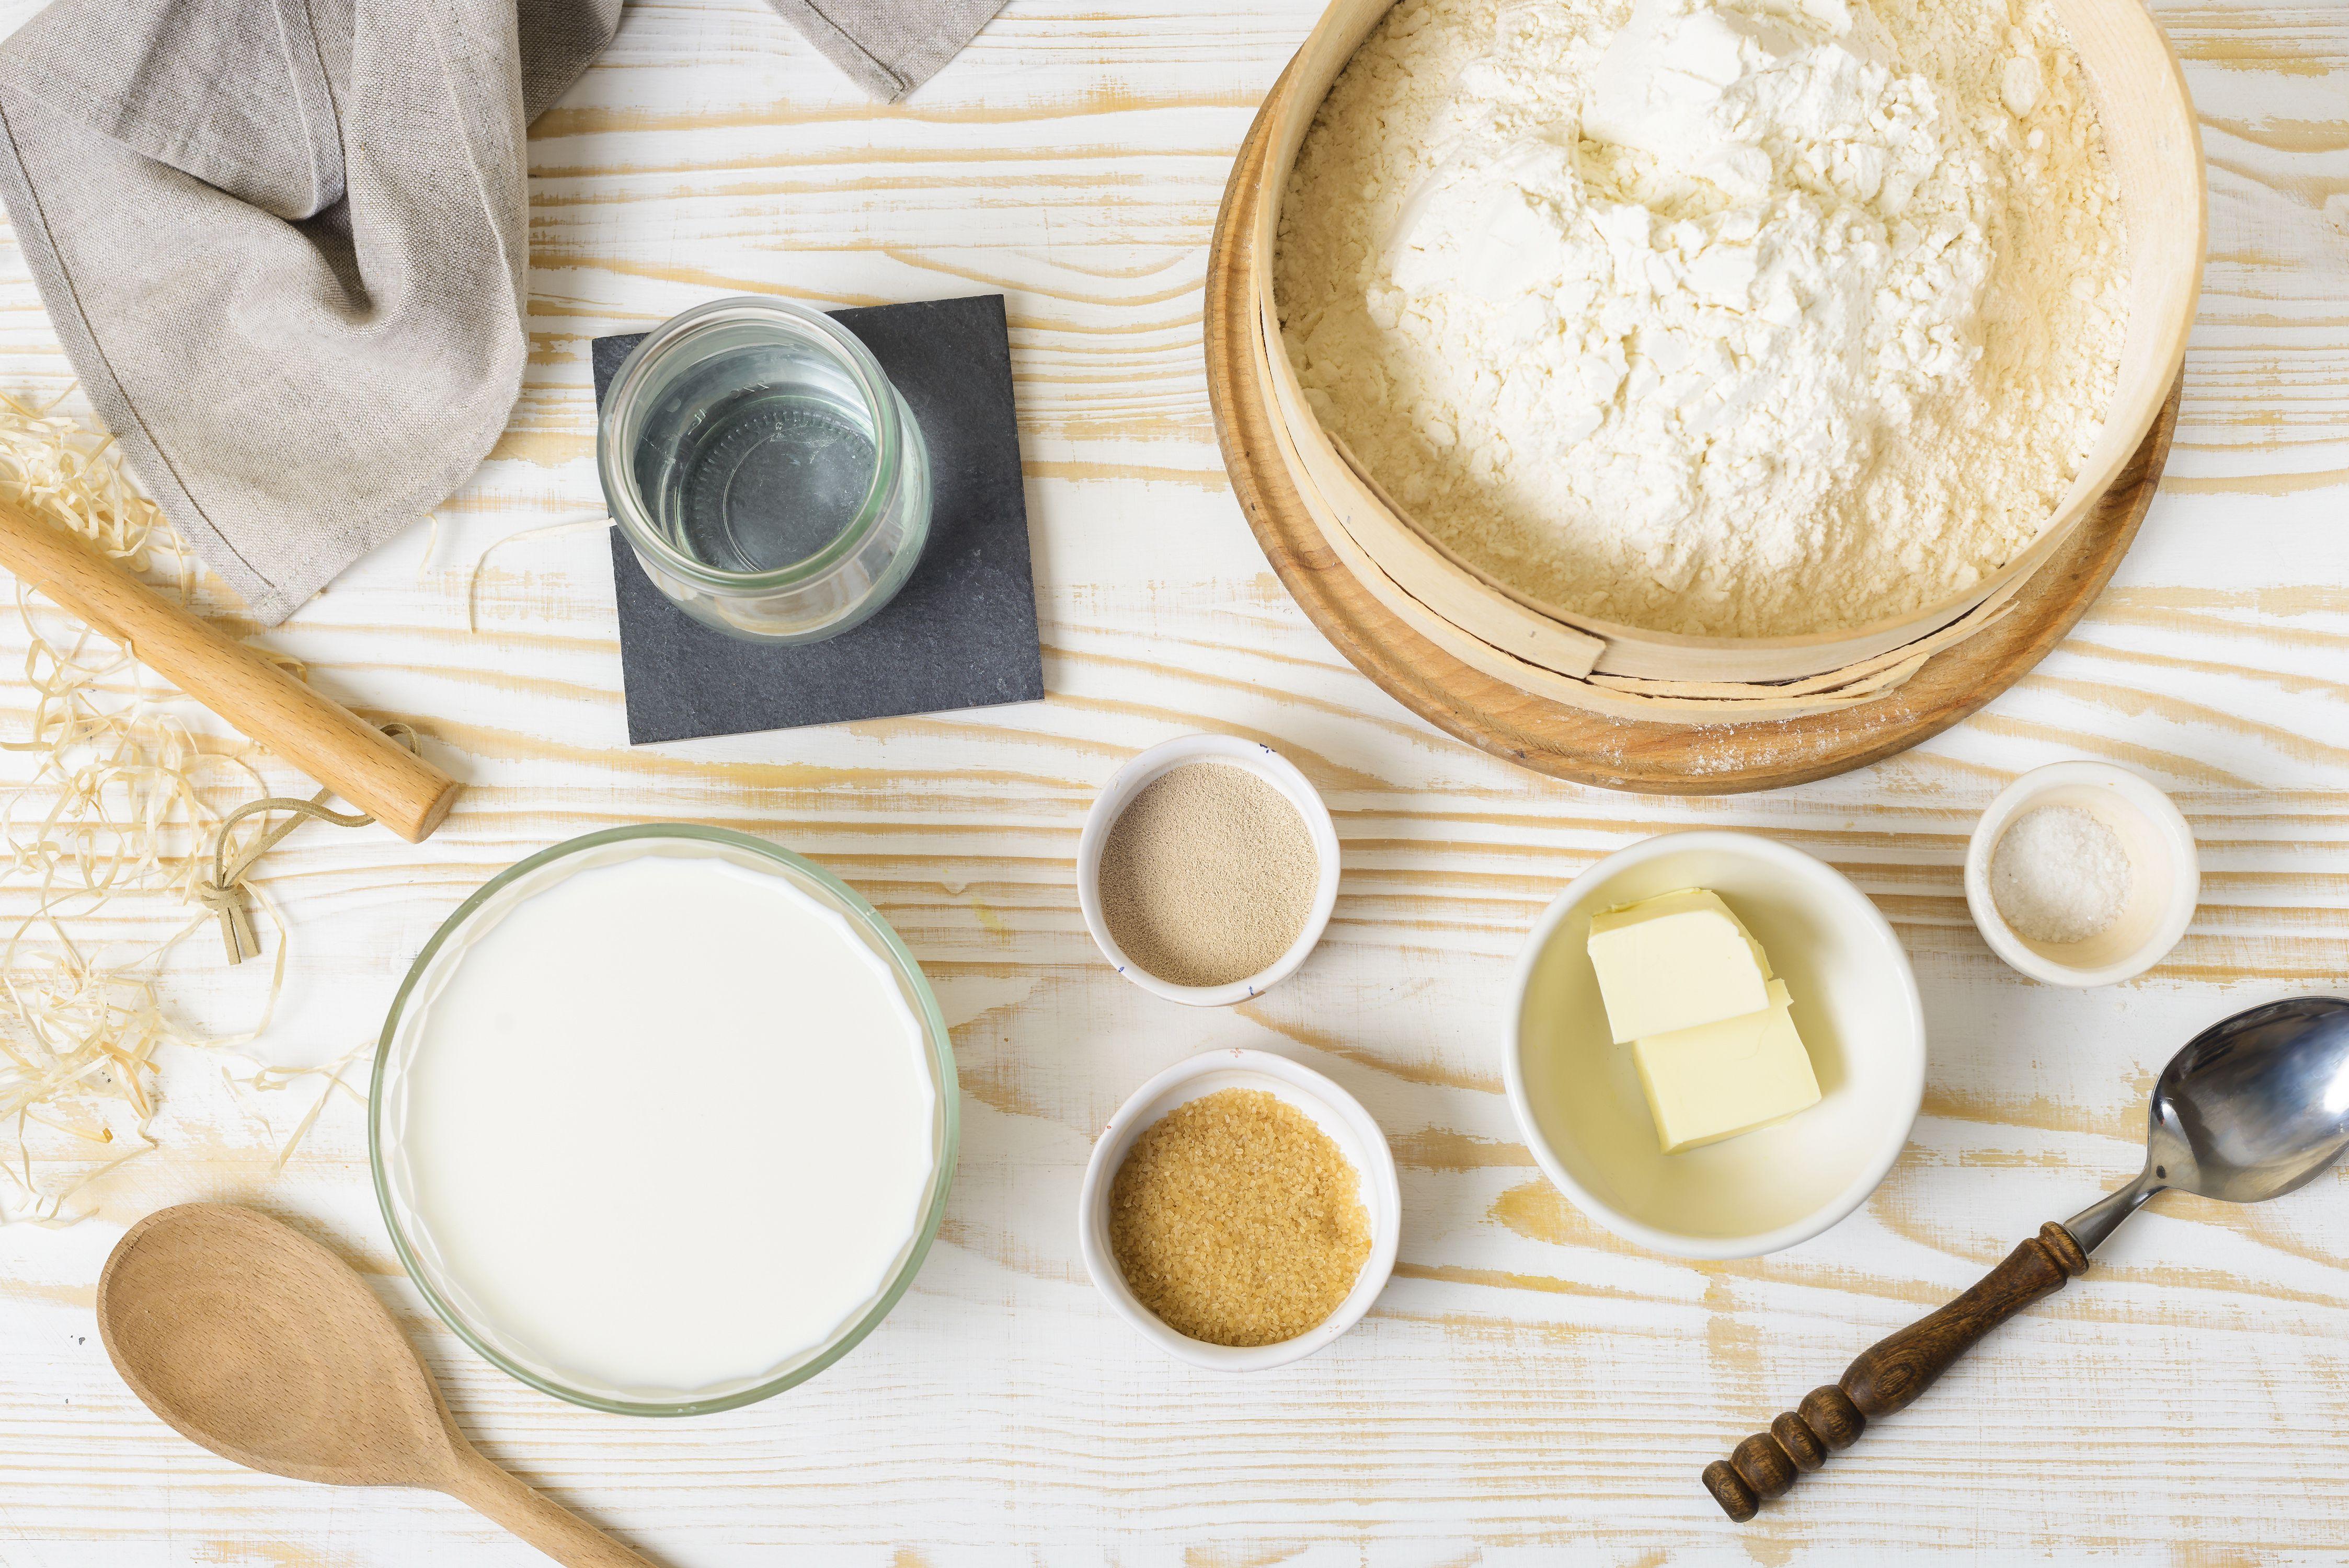 Ingredients for Amish milk bread